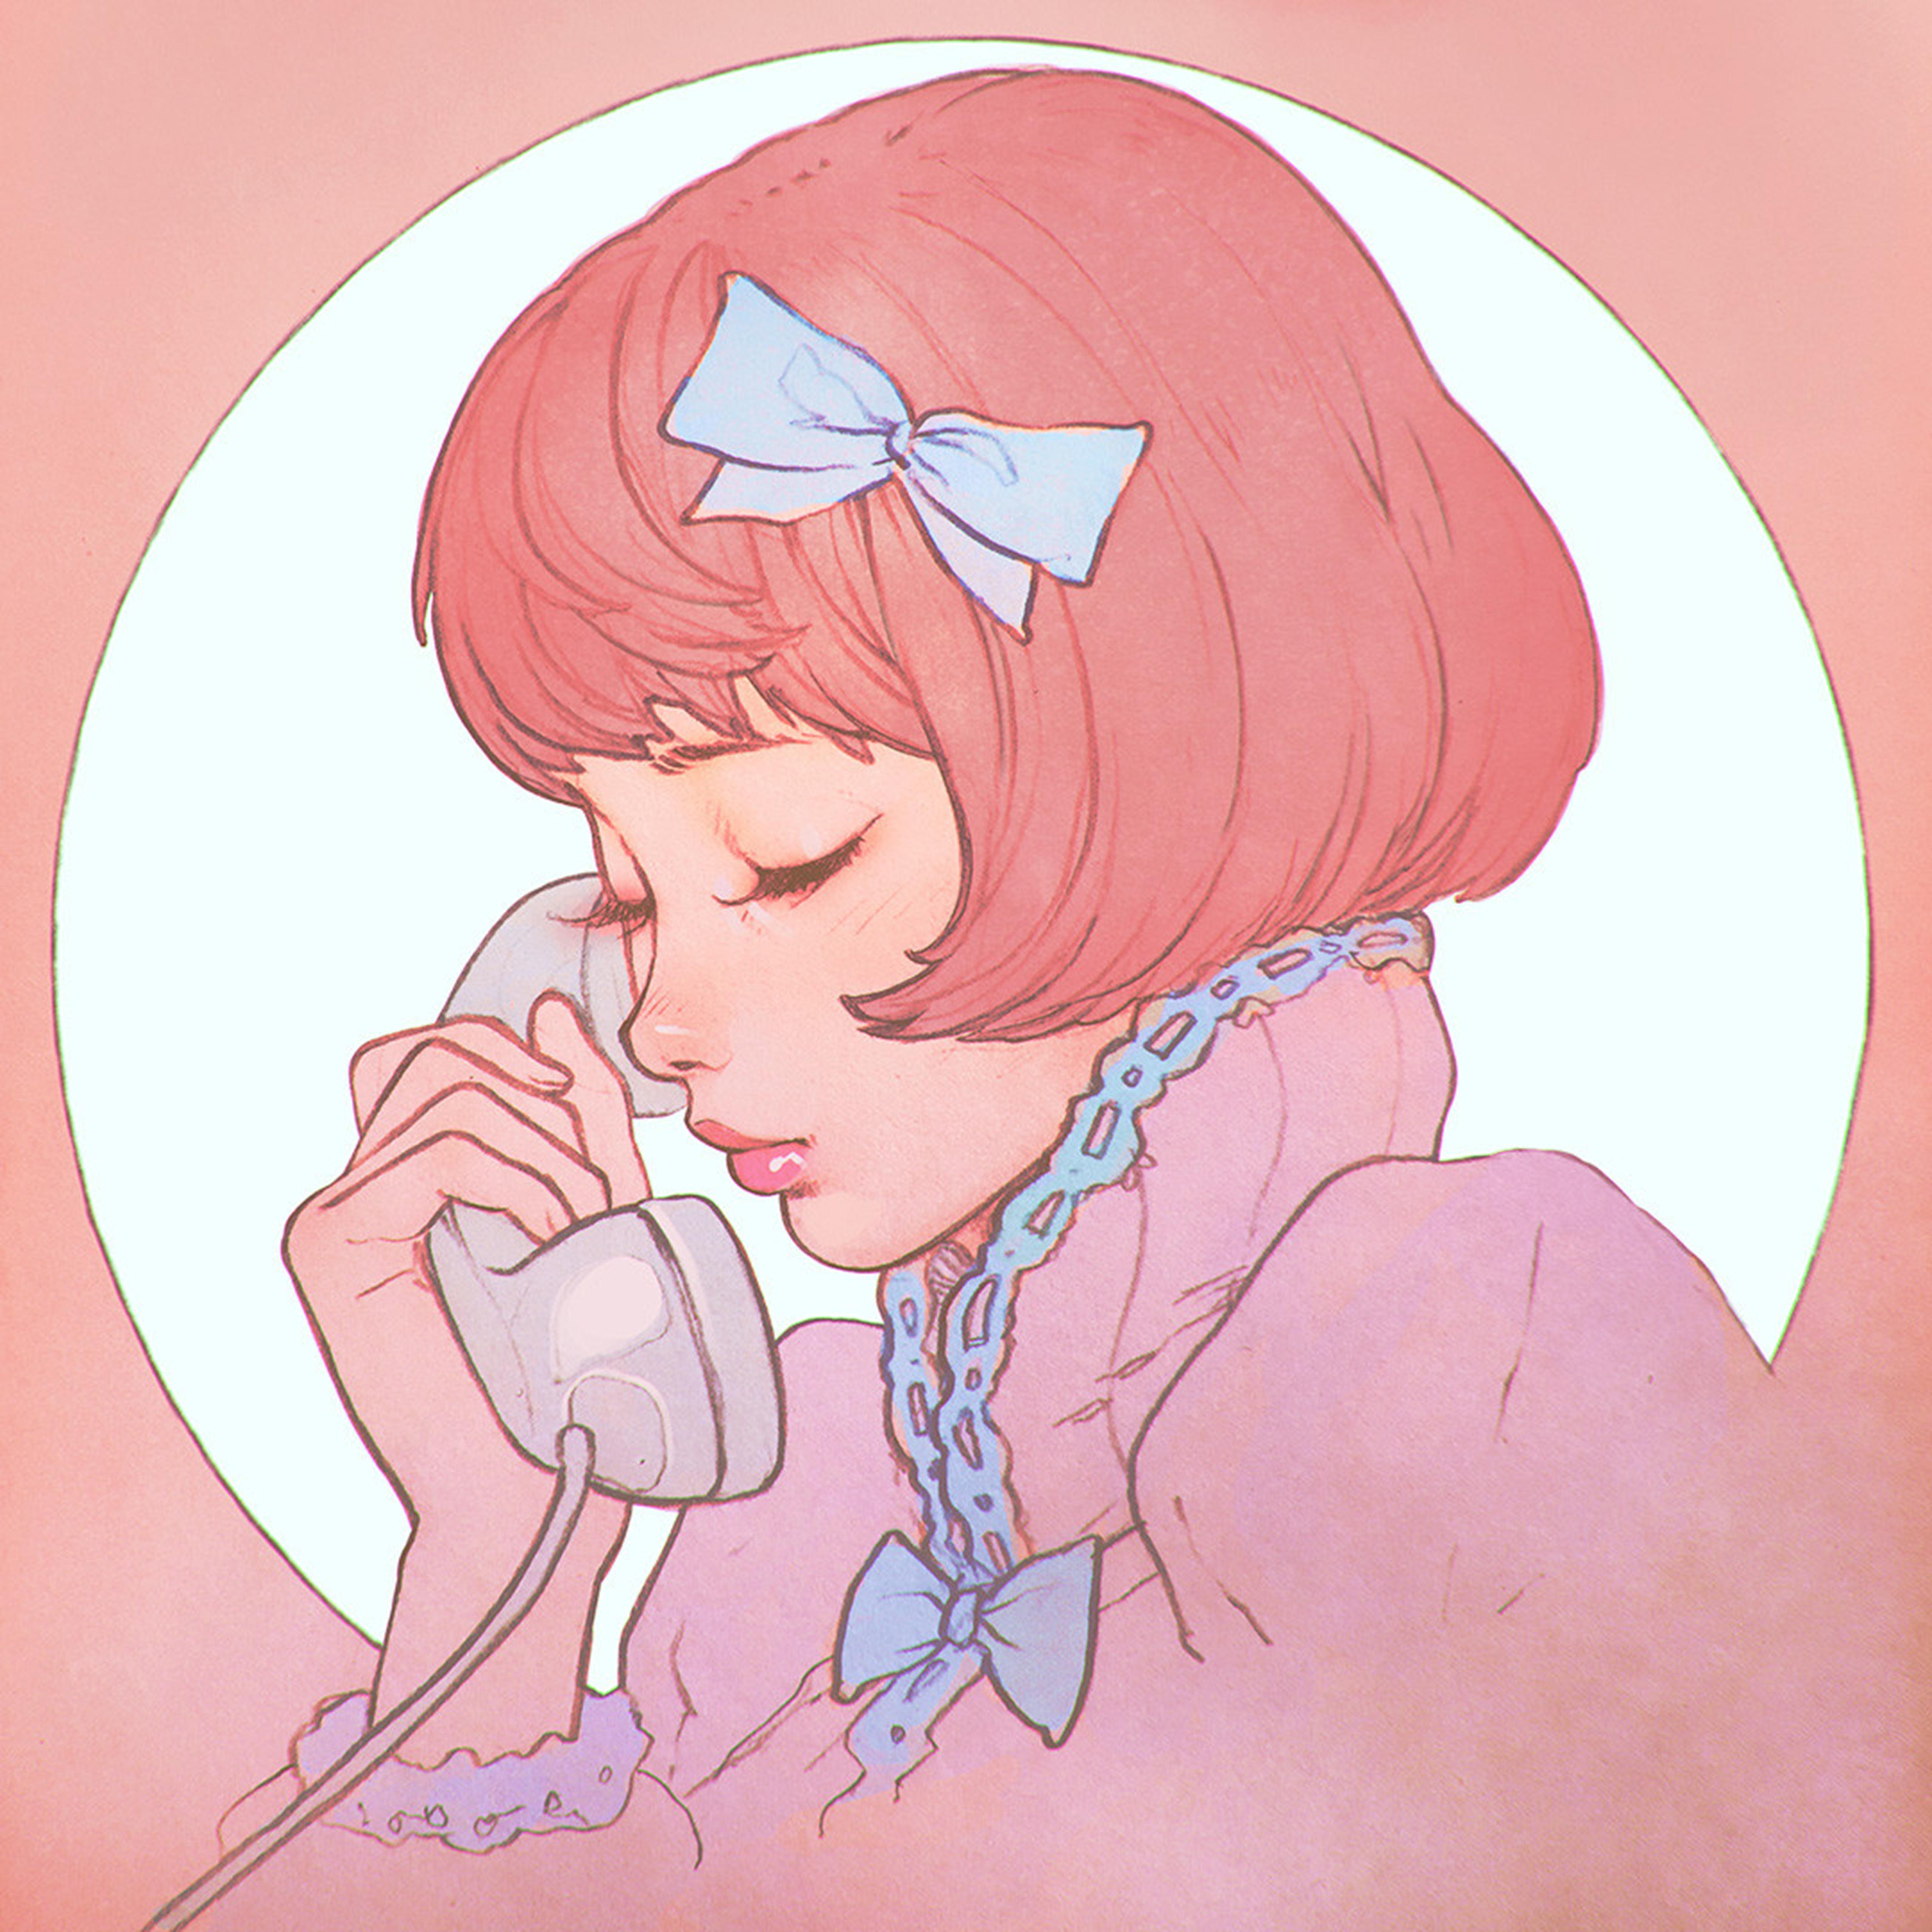 Bj13 Pink Phone Girl Cute Anime Drawing Art Ilya Wallpaper